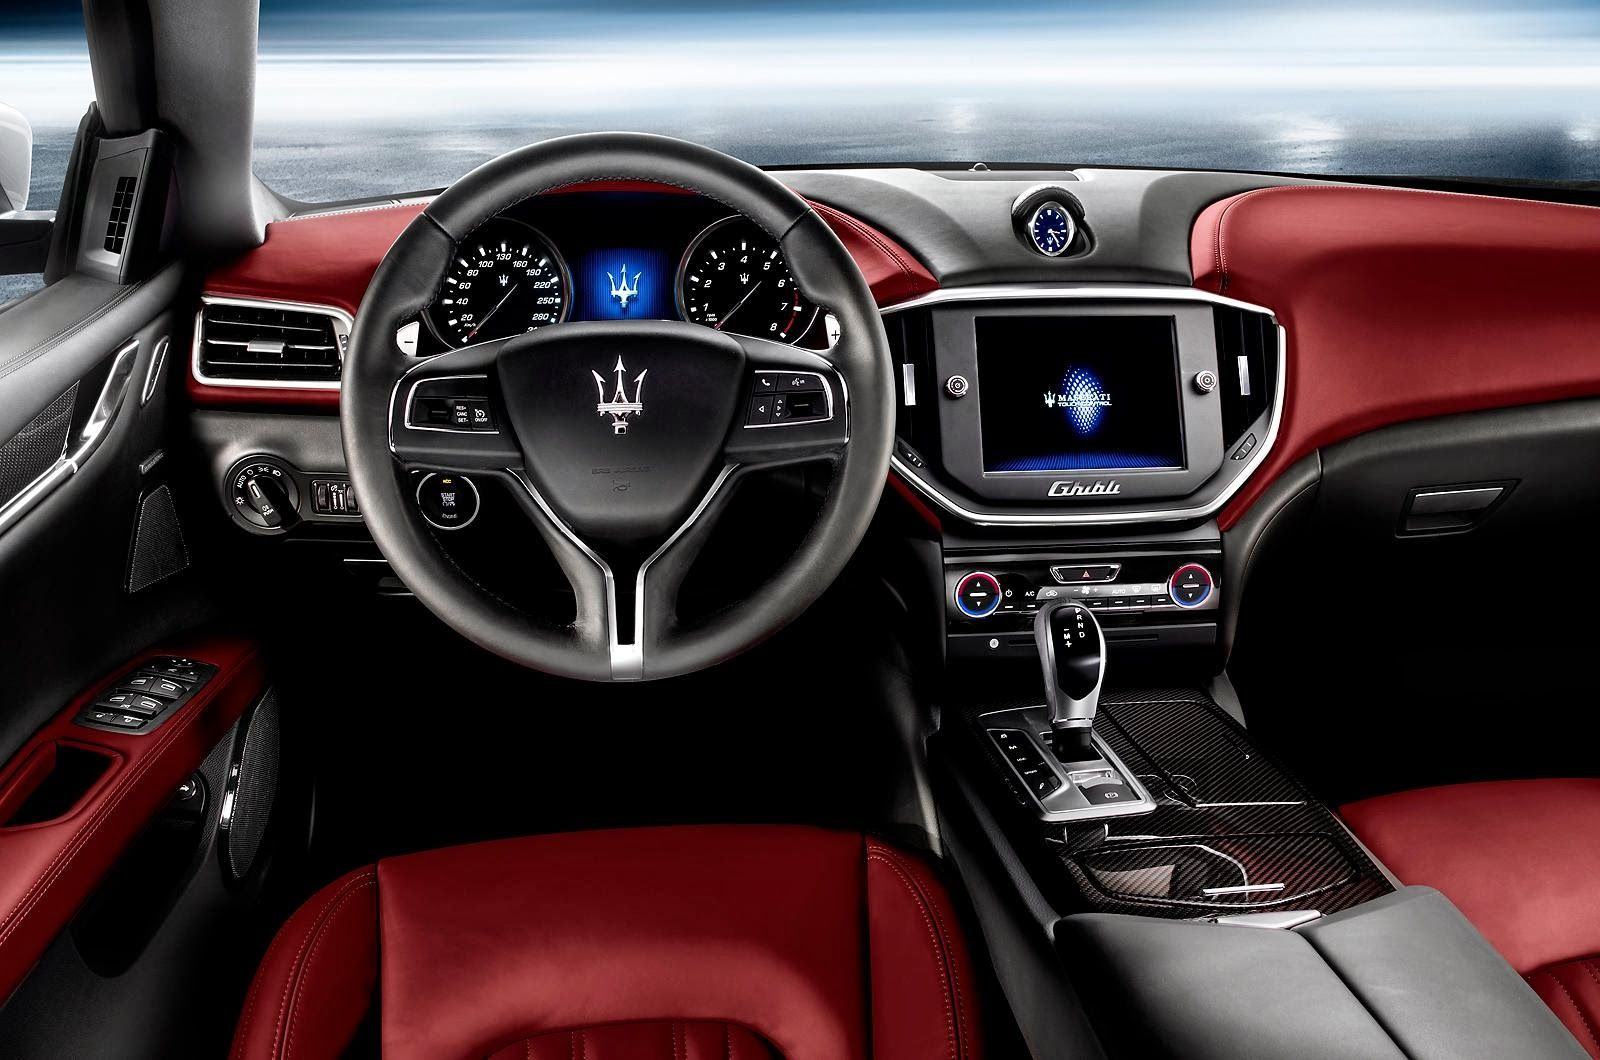 bugatti veyron interior wallpaper car wallpapers 3d wallpapers. Black Bedroom Furniture Sets. Home Design Ideas